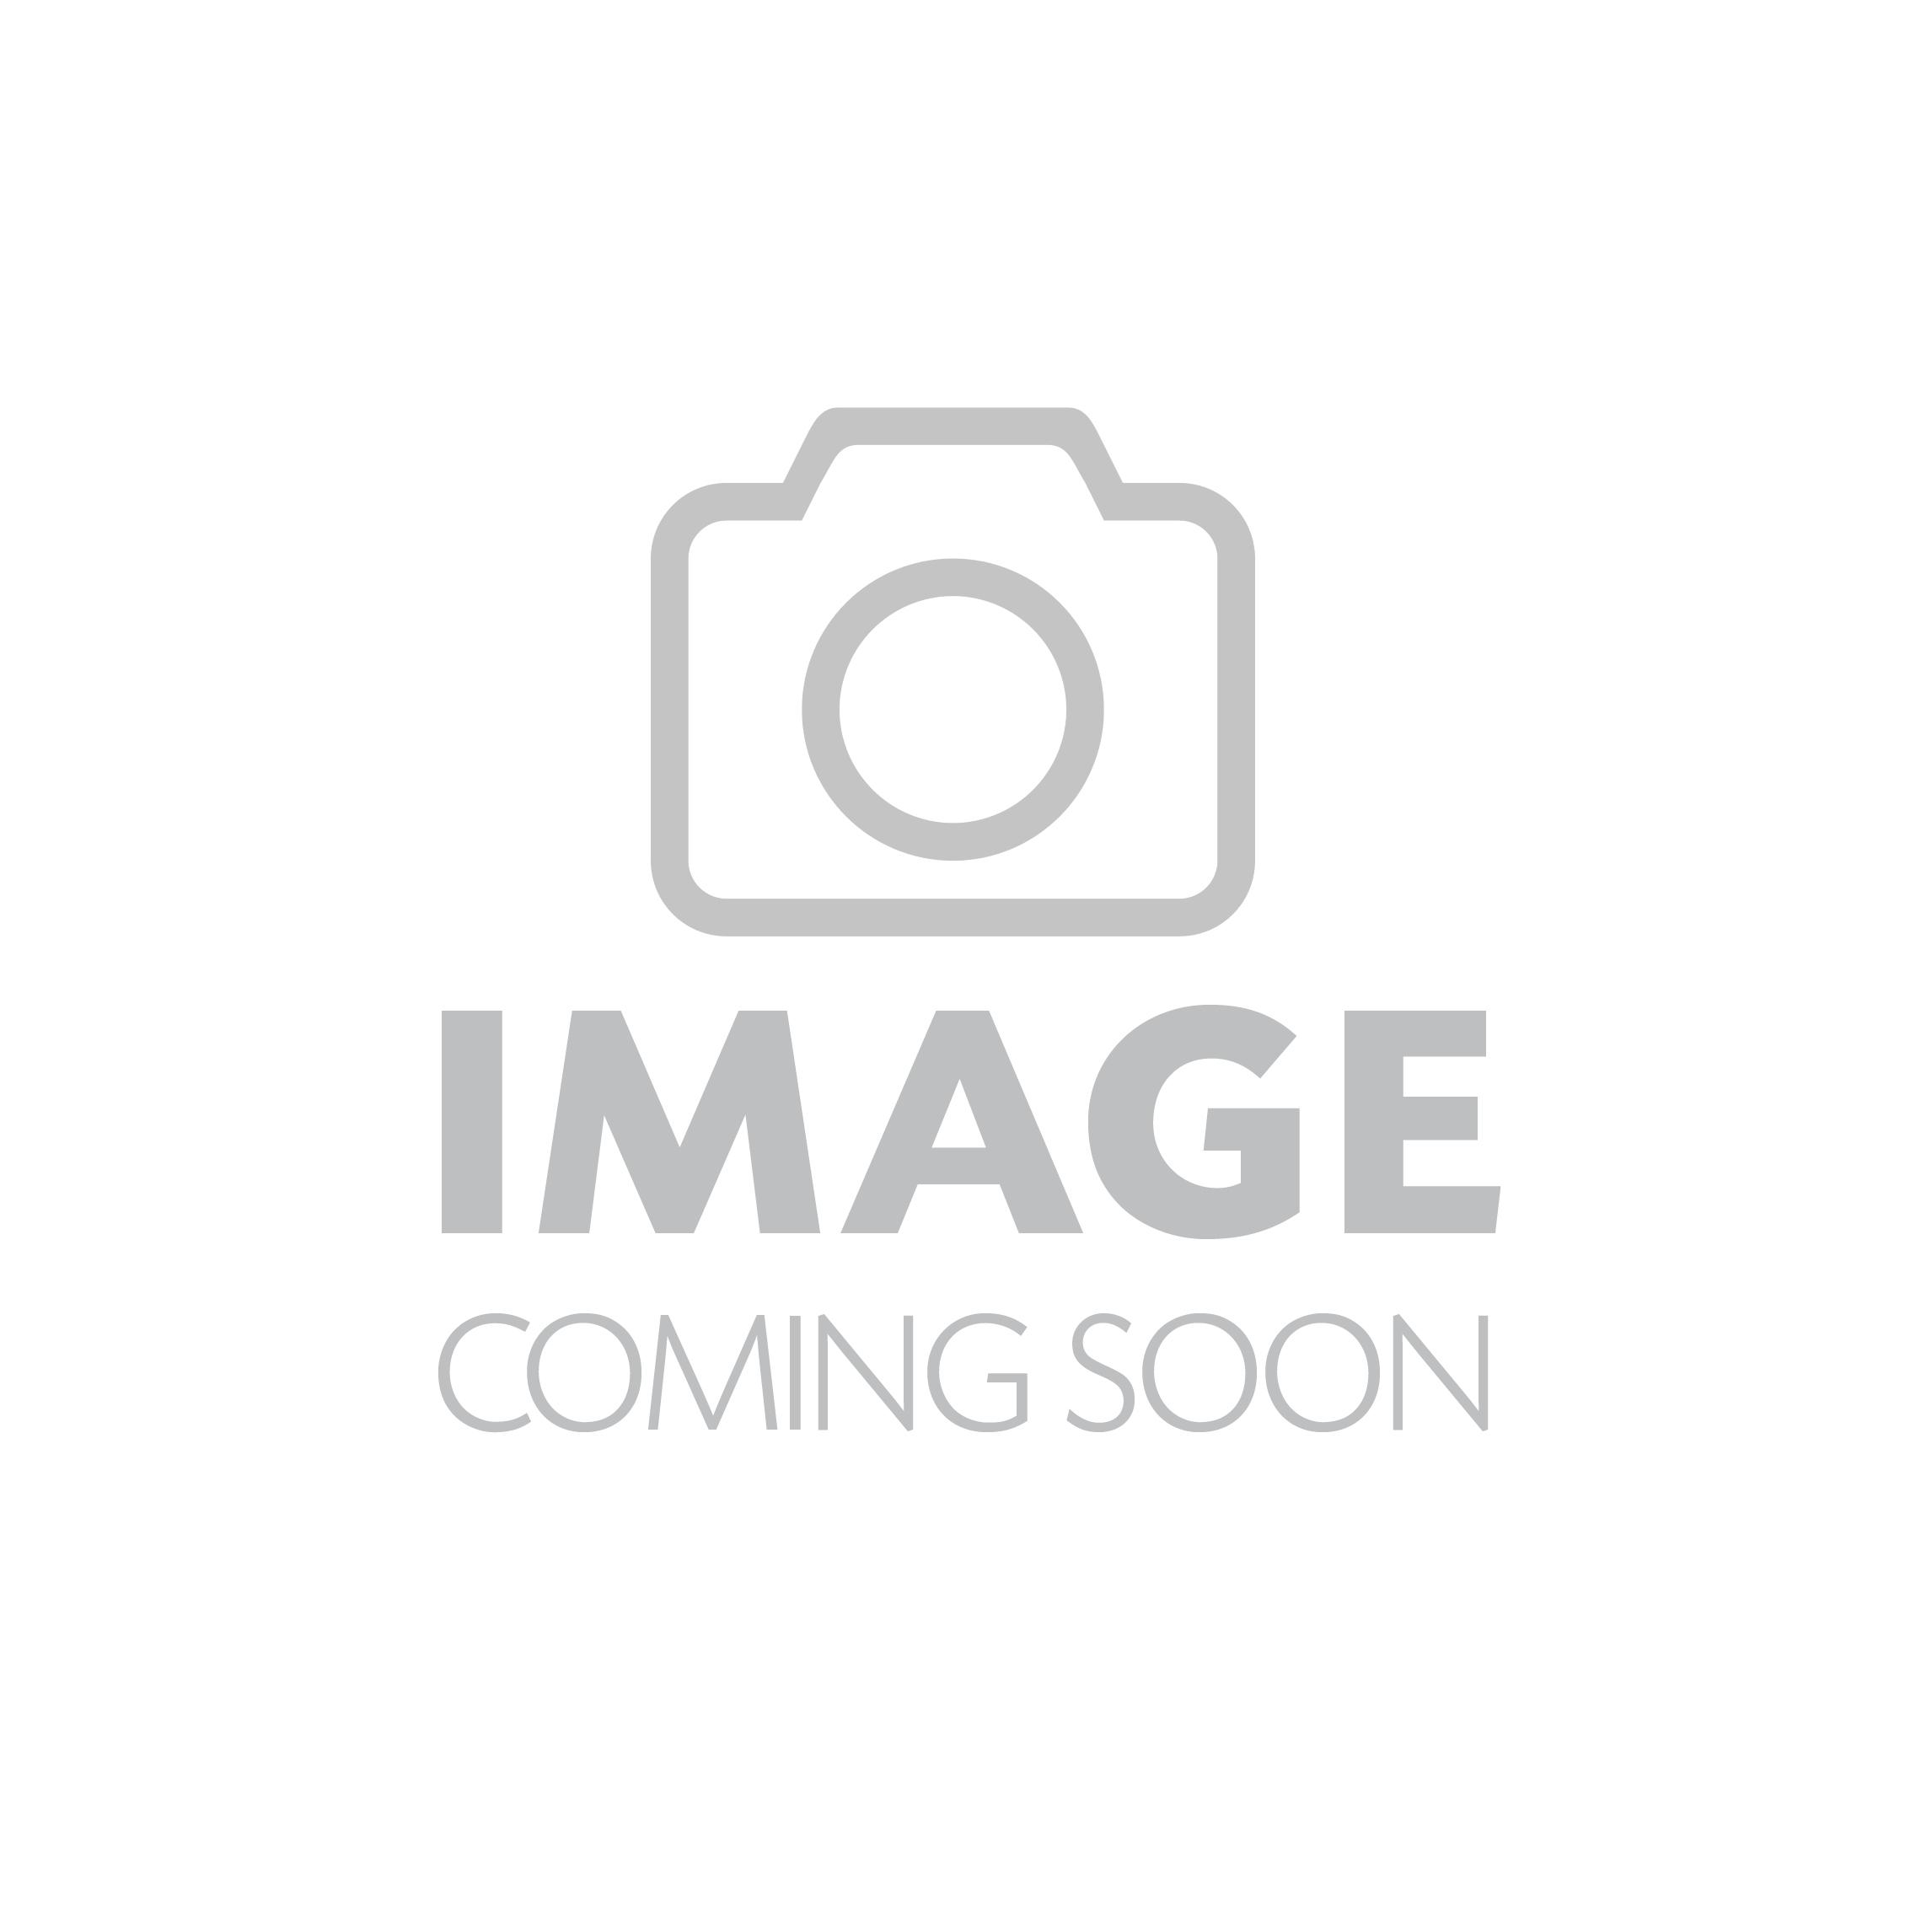 Ideal Standard Sandringham 21 450mm 2 Taphole Basin with Full Pedestal